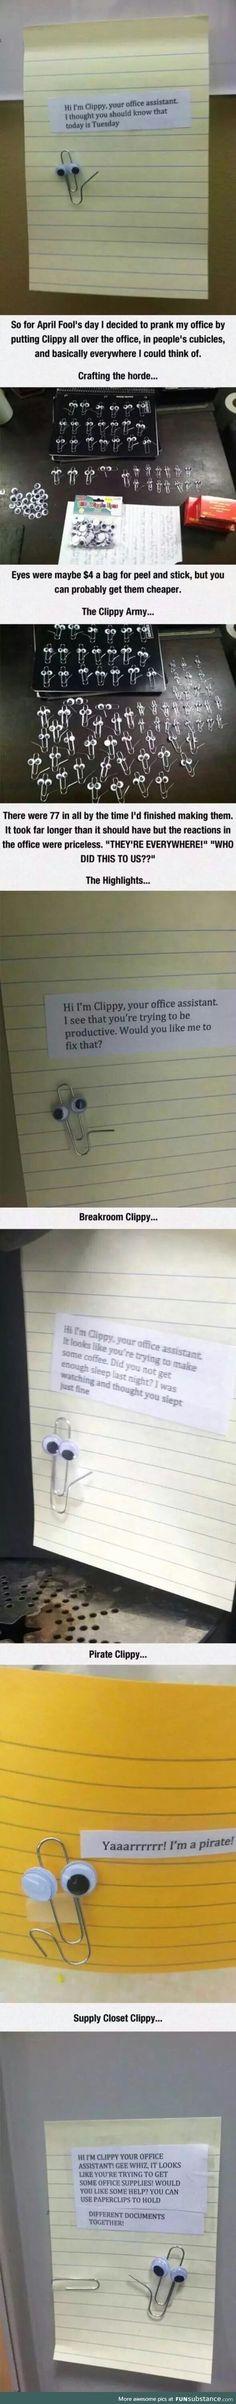 Paper clip to the rescue